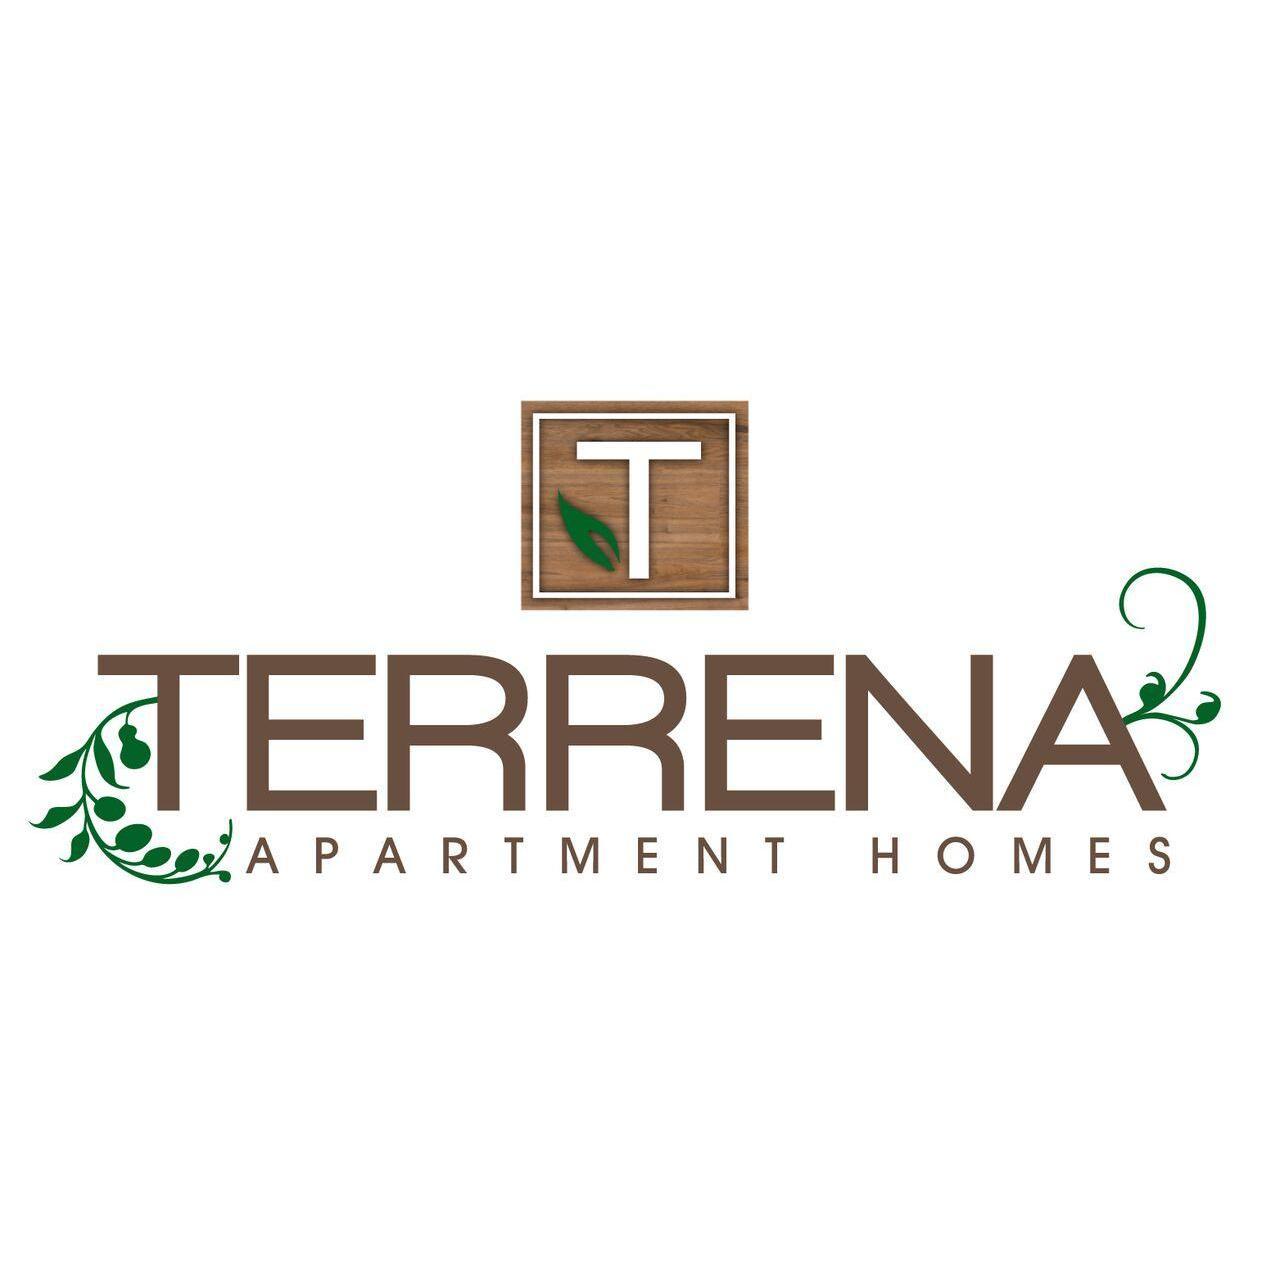 Terrena Apartment Homes